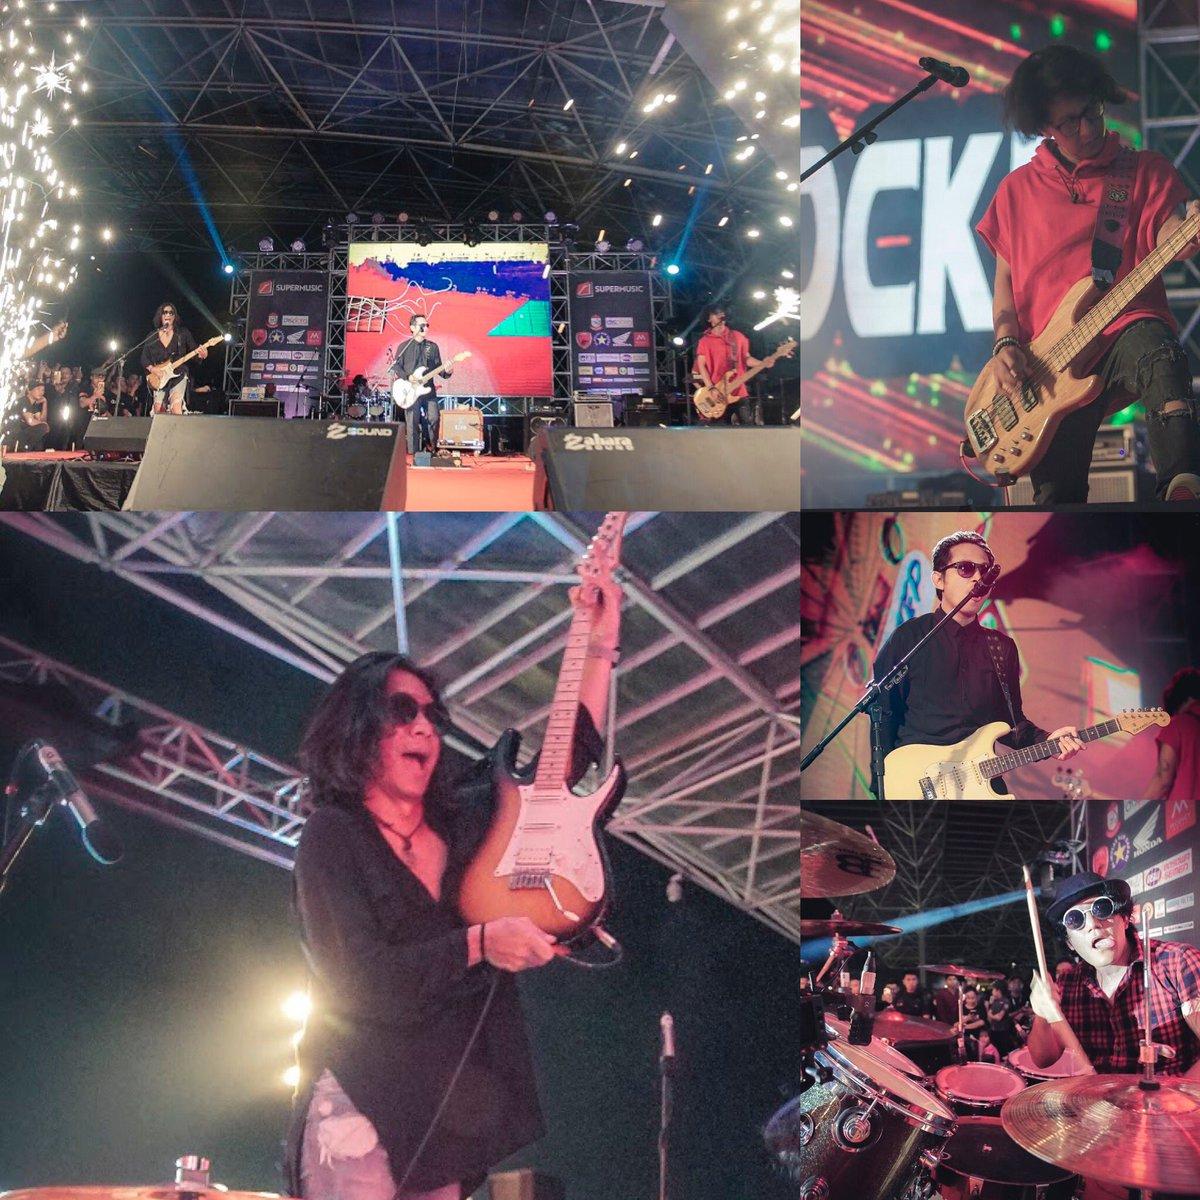 The MaczMan... Terima Kasih!!! Malam yang super seru di kota Makassar.. @supermusic_id Ewakoo!!!!. 1Spirit!!!. . 📷: @abekbaek https://t.co/Tp4rmmVcnZ